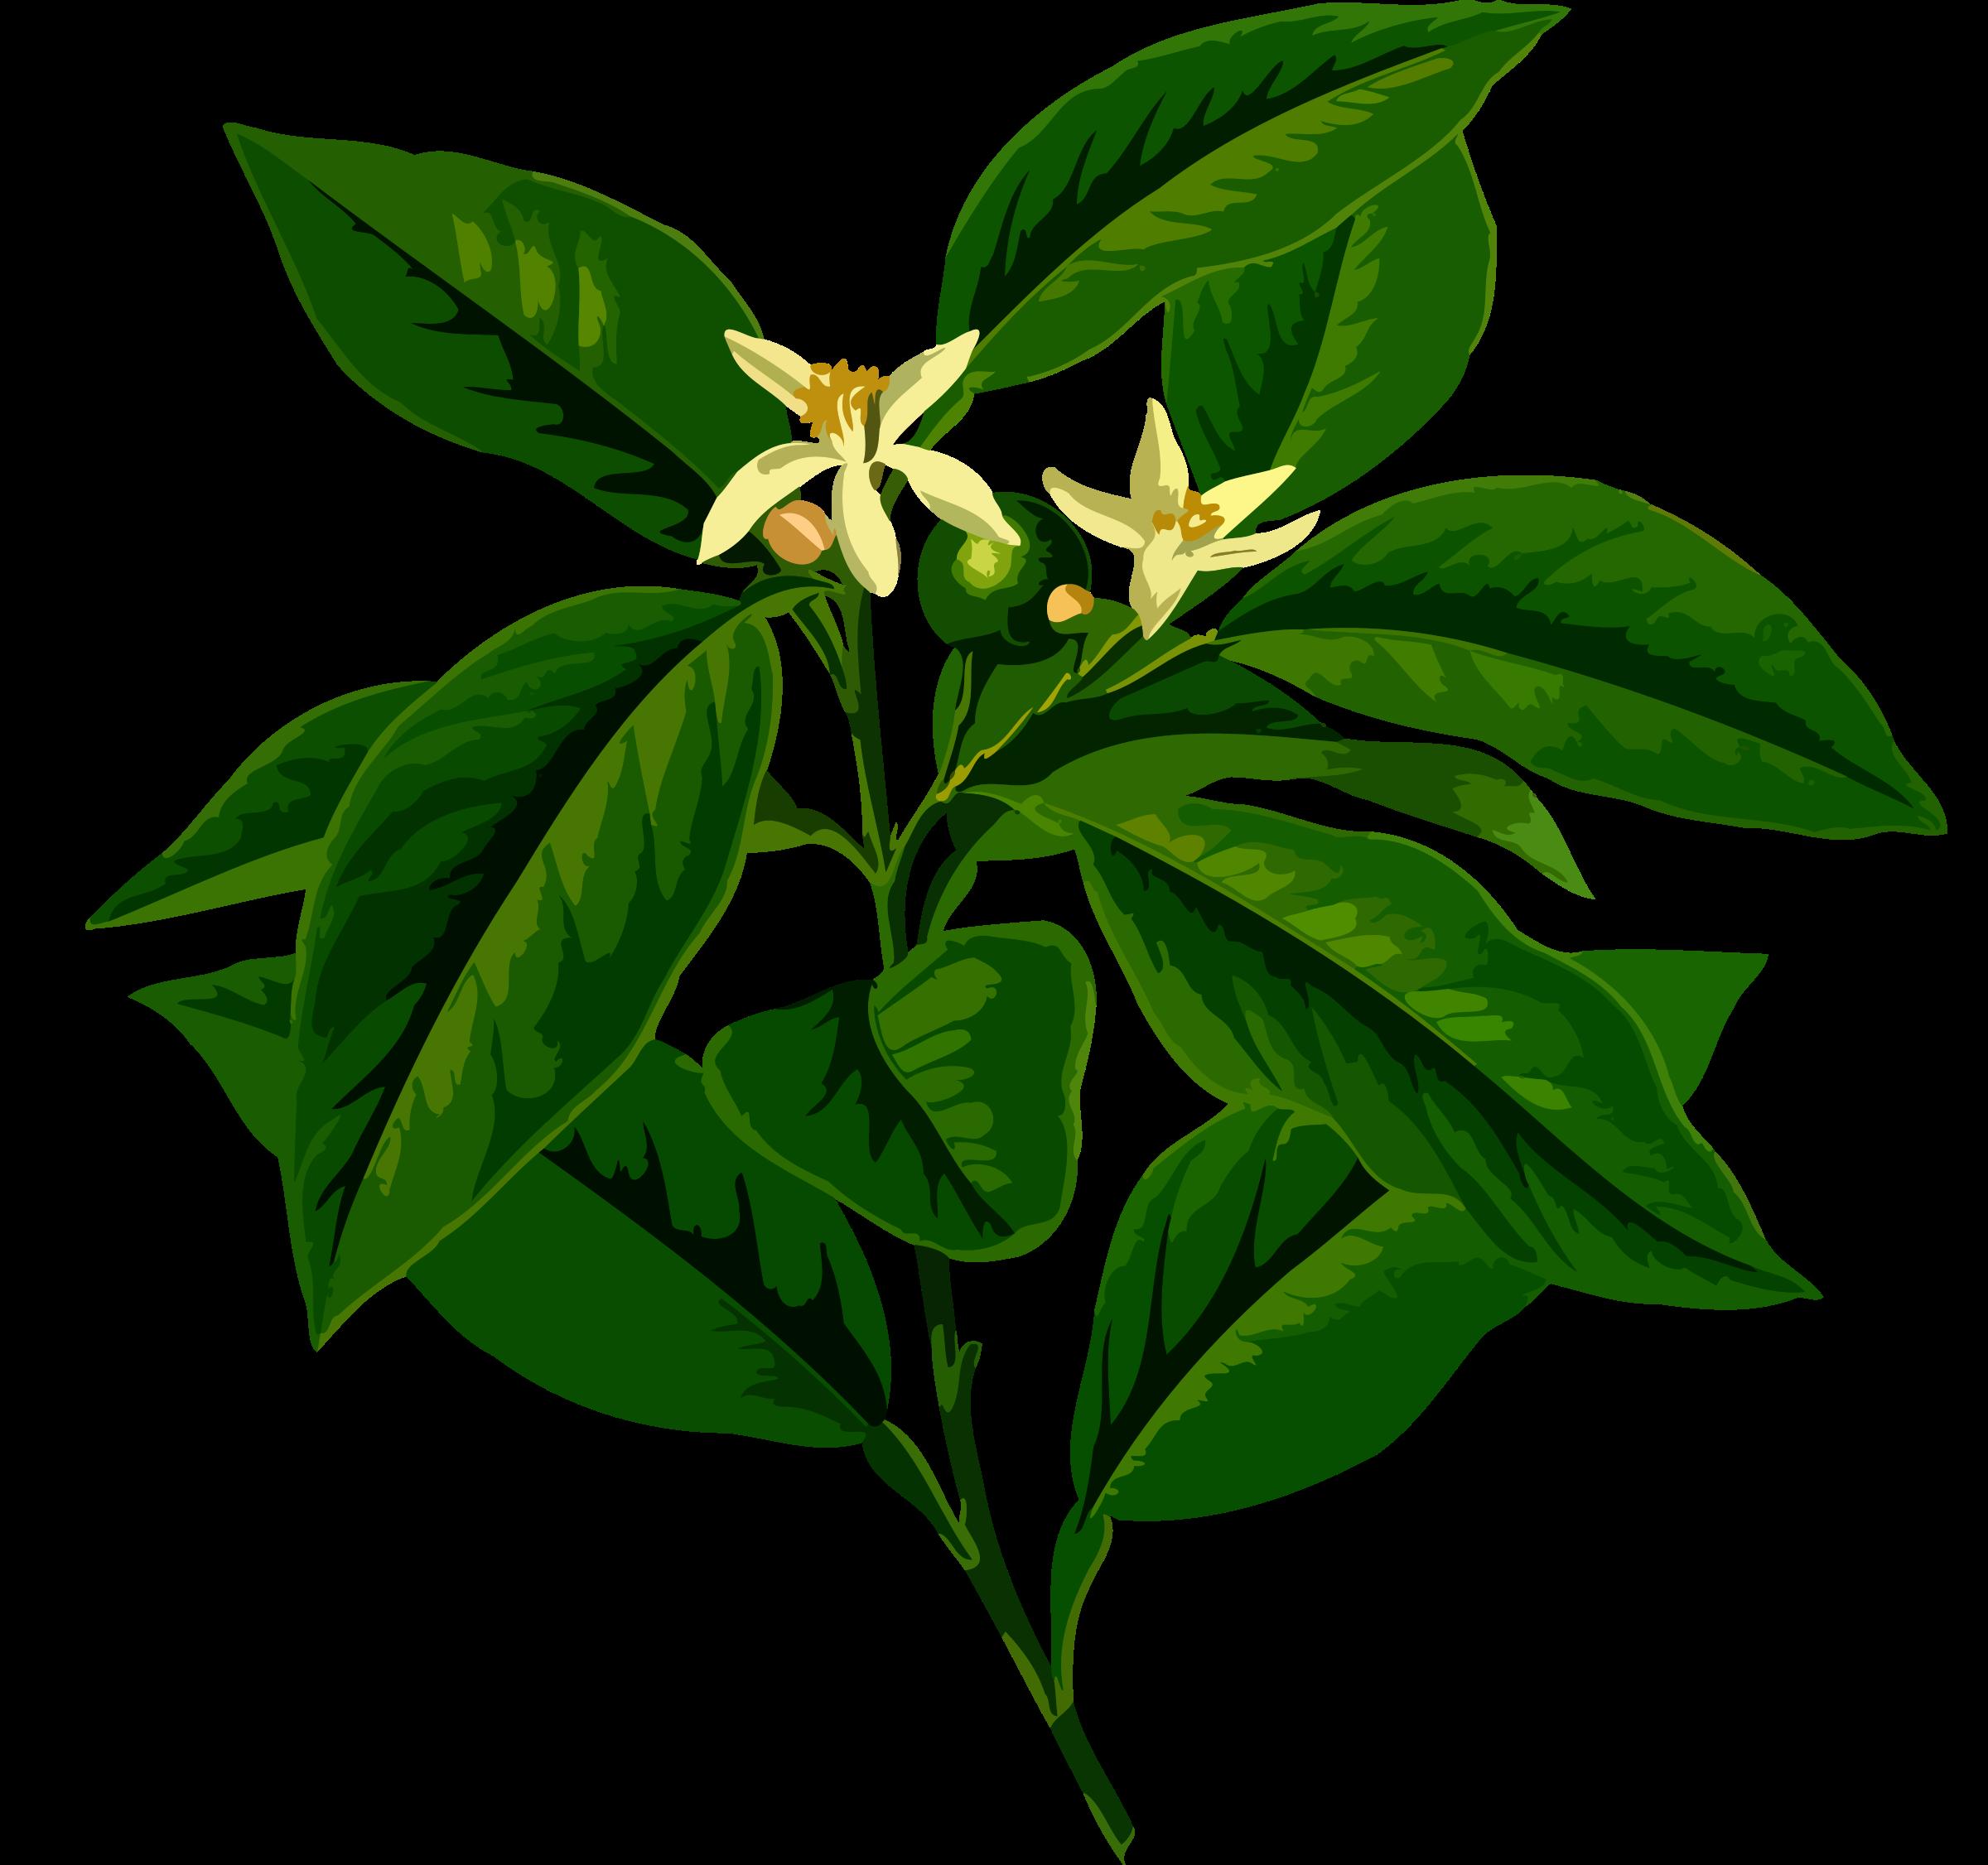 Lemons clipart citrus tree. Lemon low resolution big